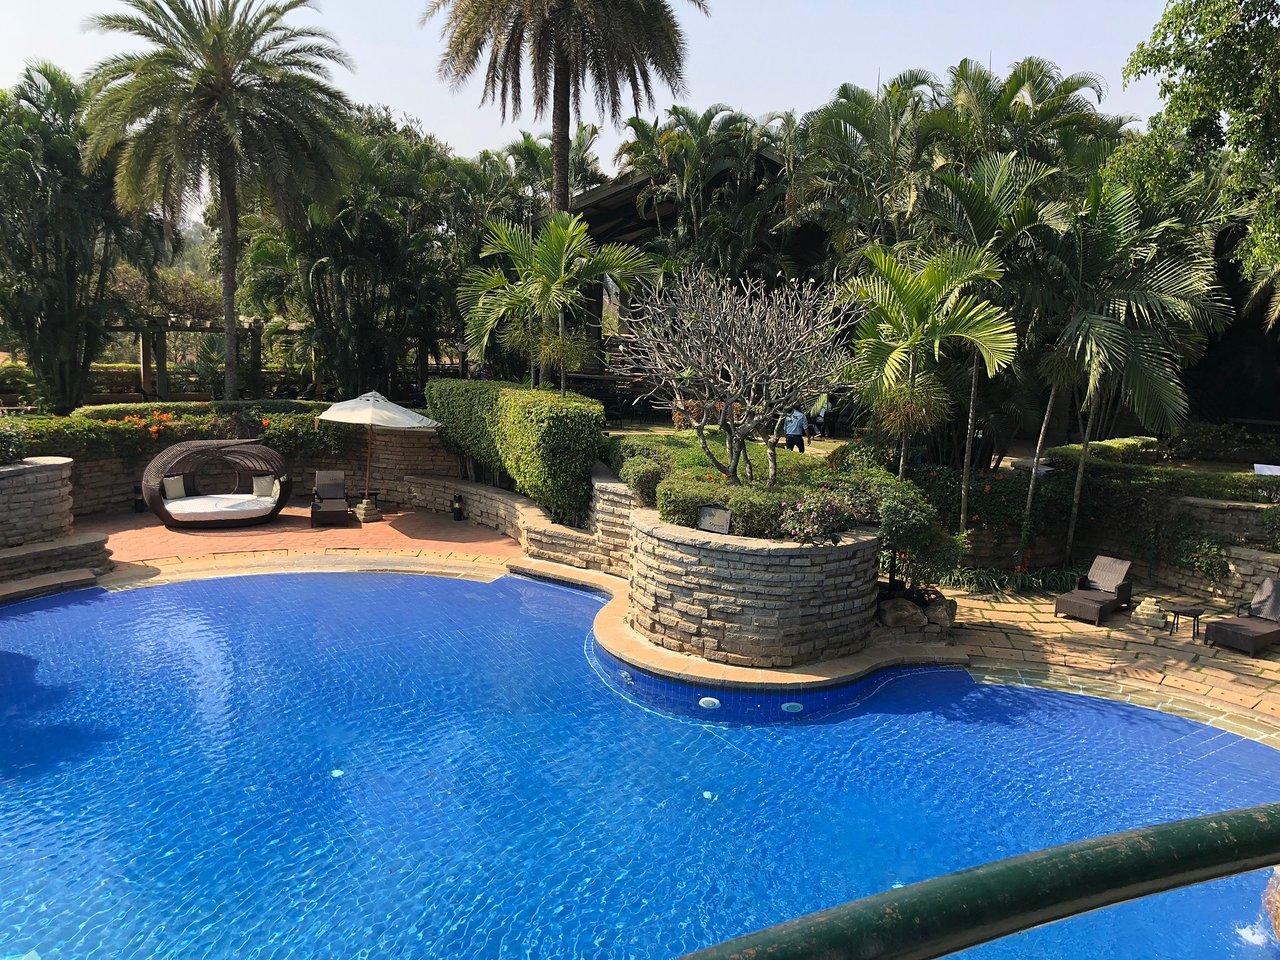 ANGSANA OASIS SPA & RESORT (Bengaluru) - Hotel Reviews, Photos, Rate Comparison - Tripadvisor